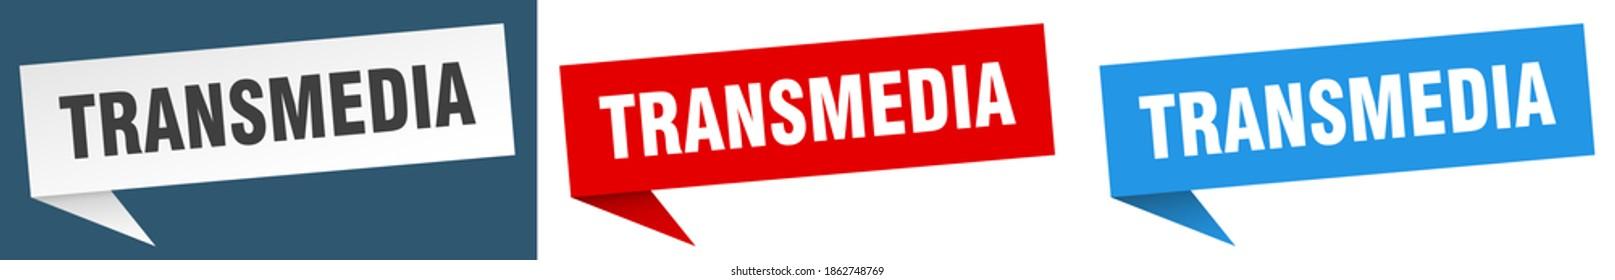 transmedia banner sign. transmedia speech bubble label set